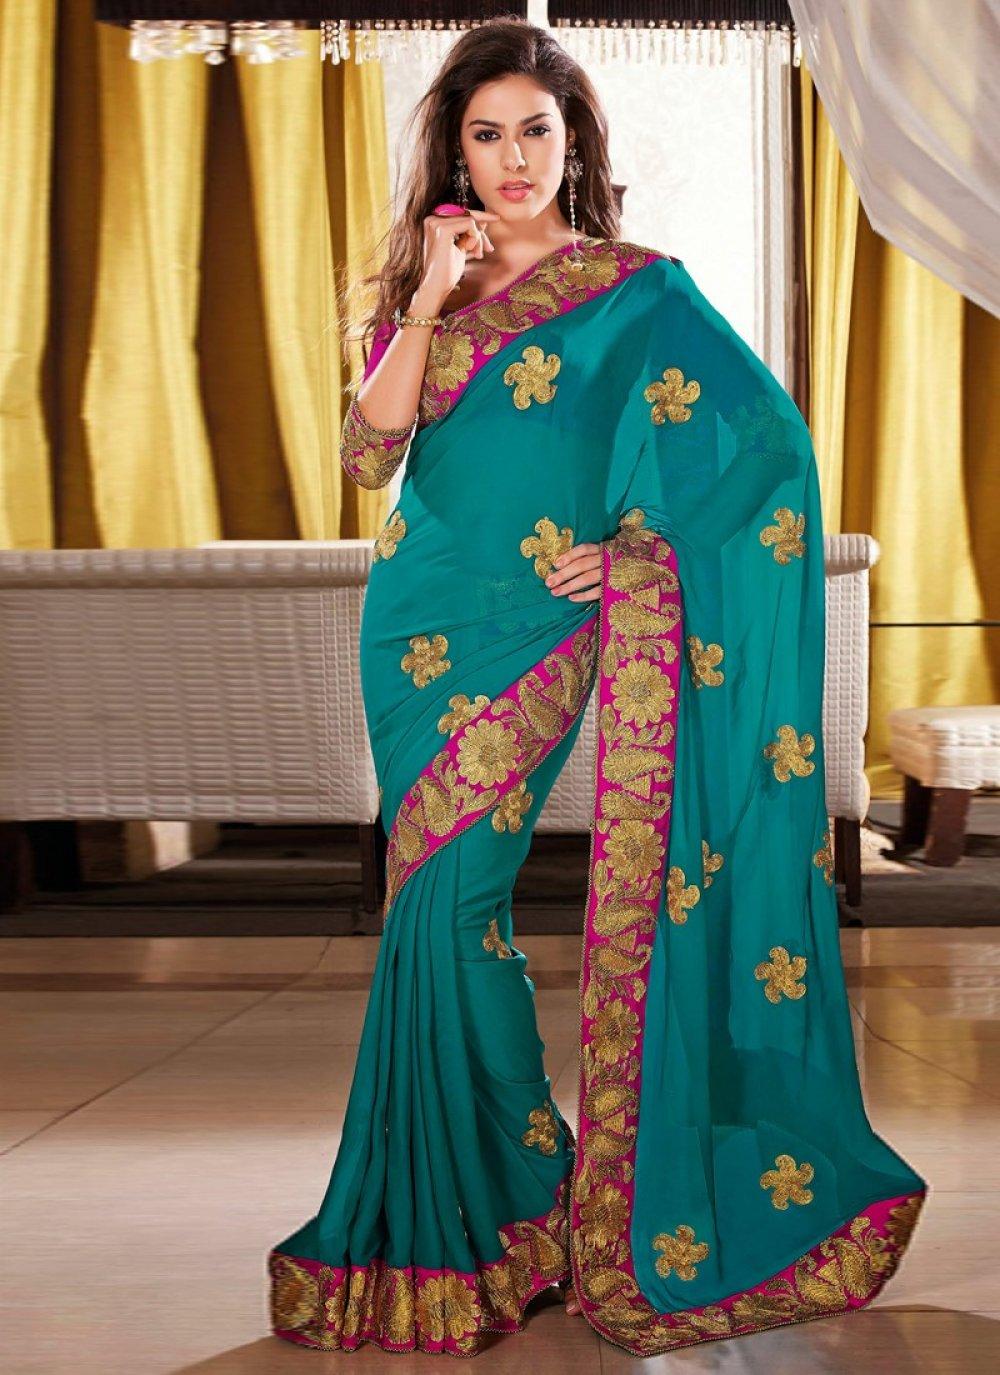 Teal Resham Work Wedding Saree